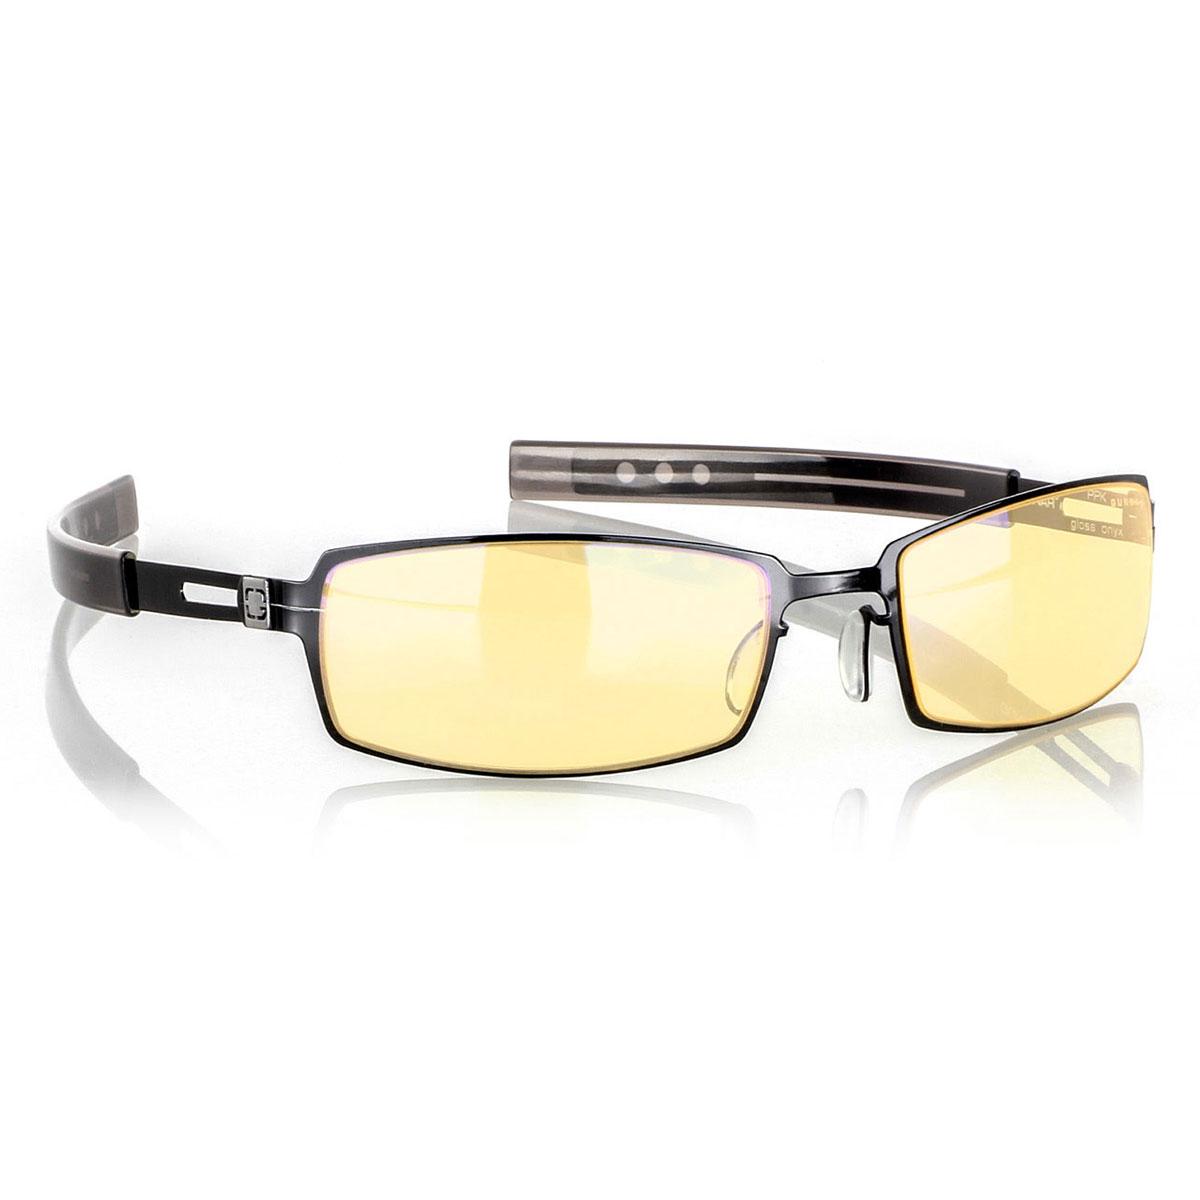 gunnar ppk onyx lunettes de protection gunnar sur. Black Bedroom Furniture Sets. Home Design Ideas